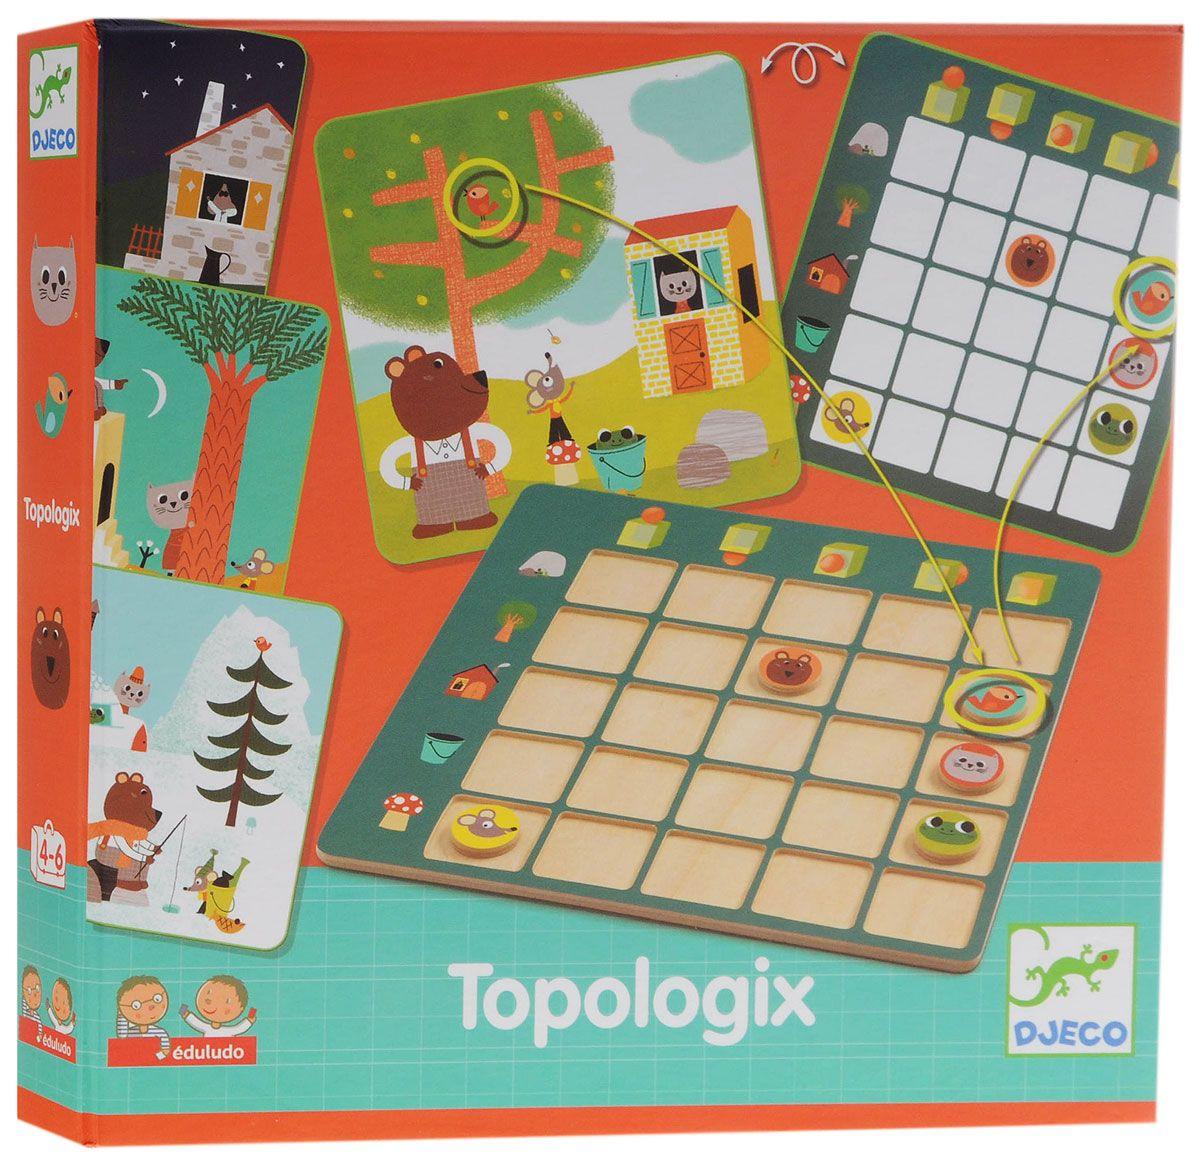 Eduludo - Topologix